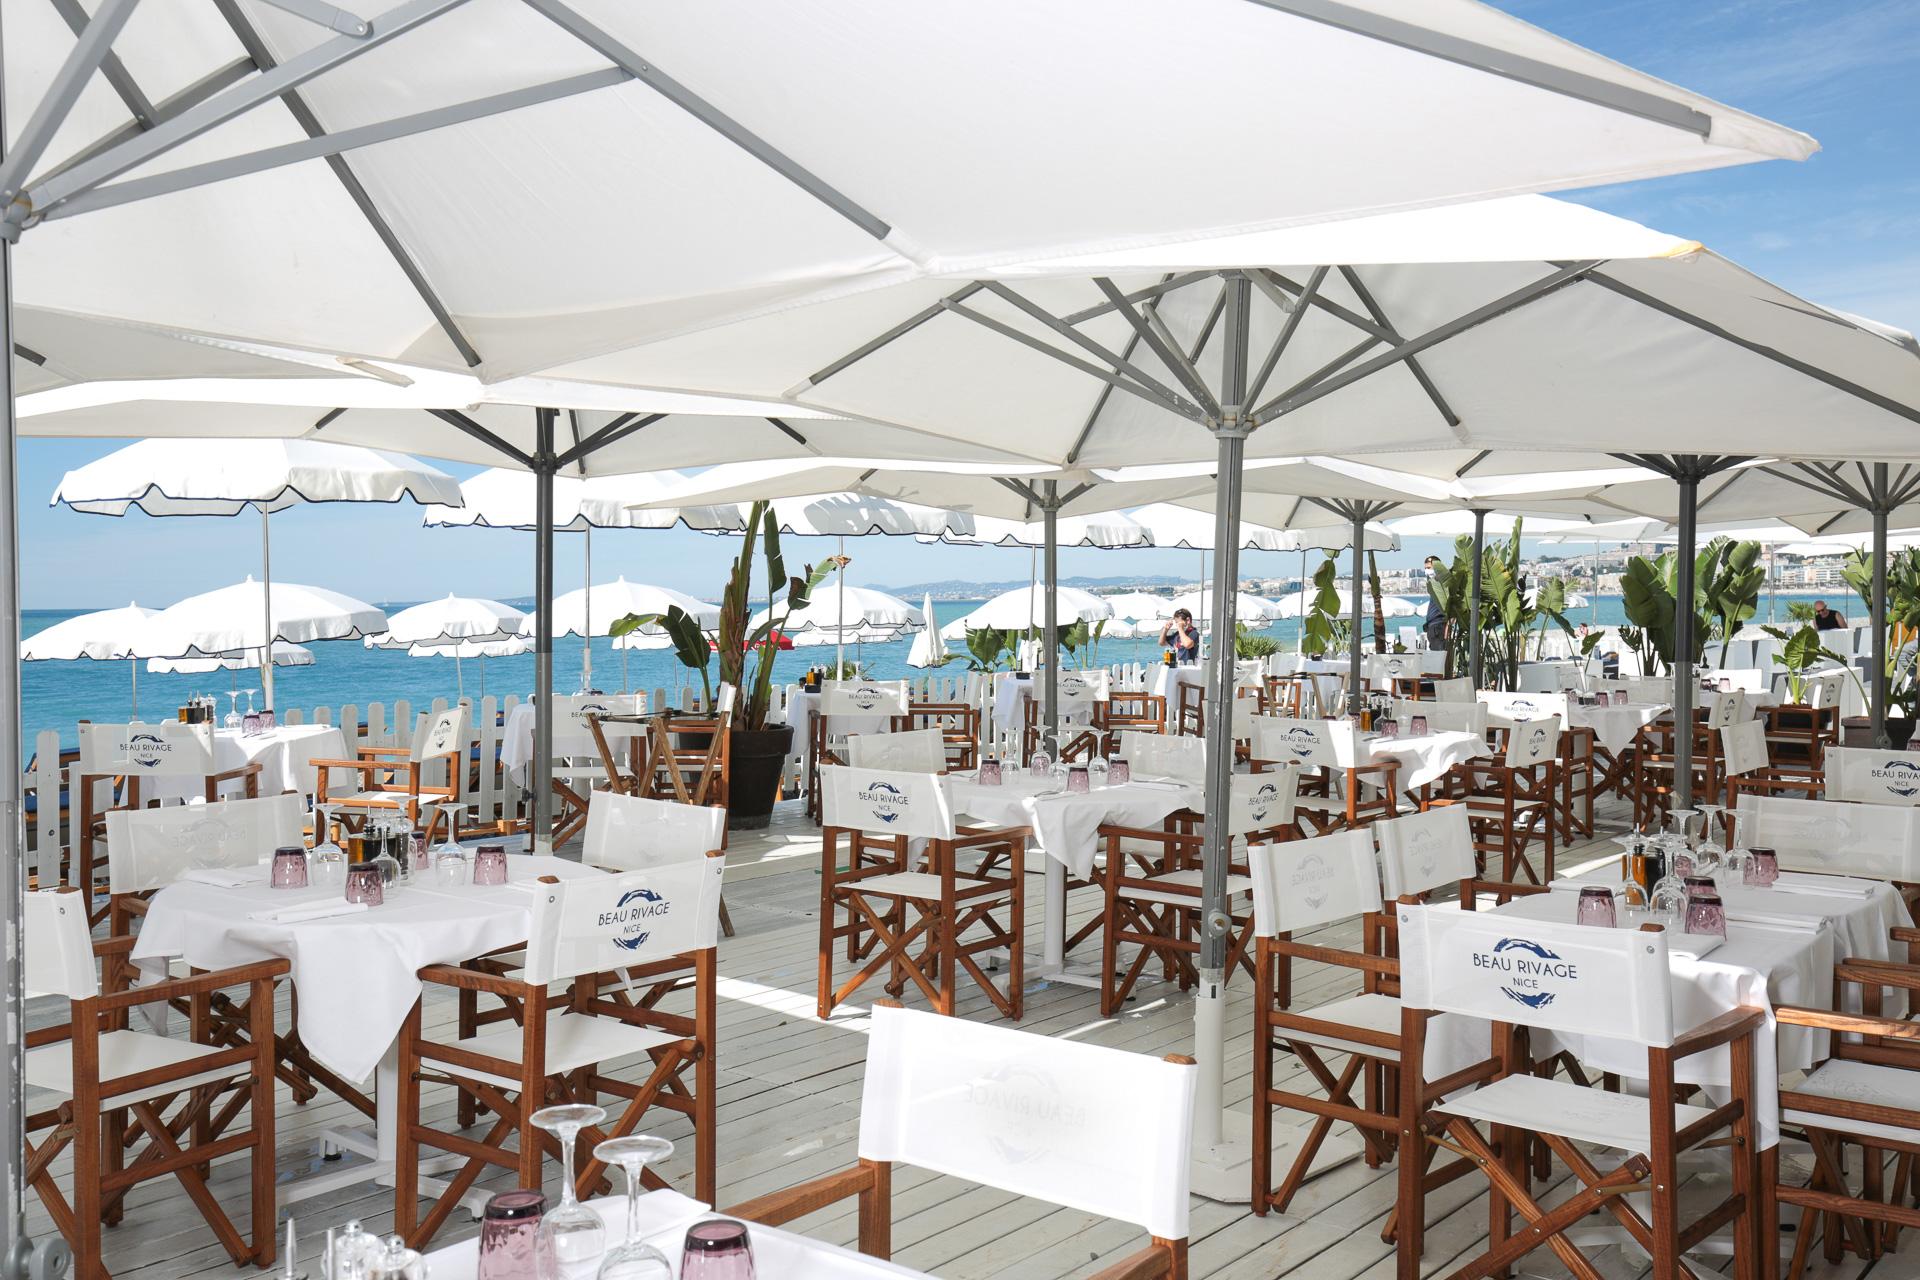 Restaurant Plage Beau Rivage